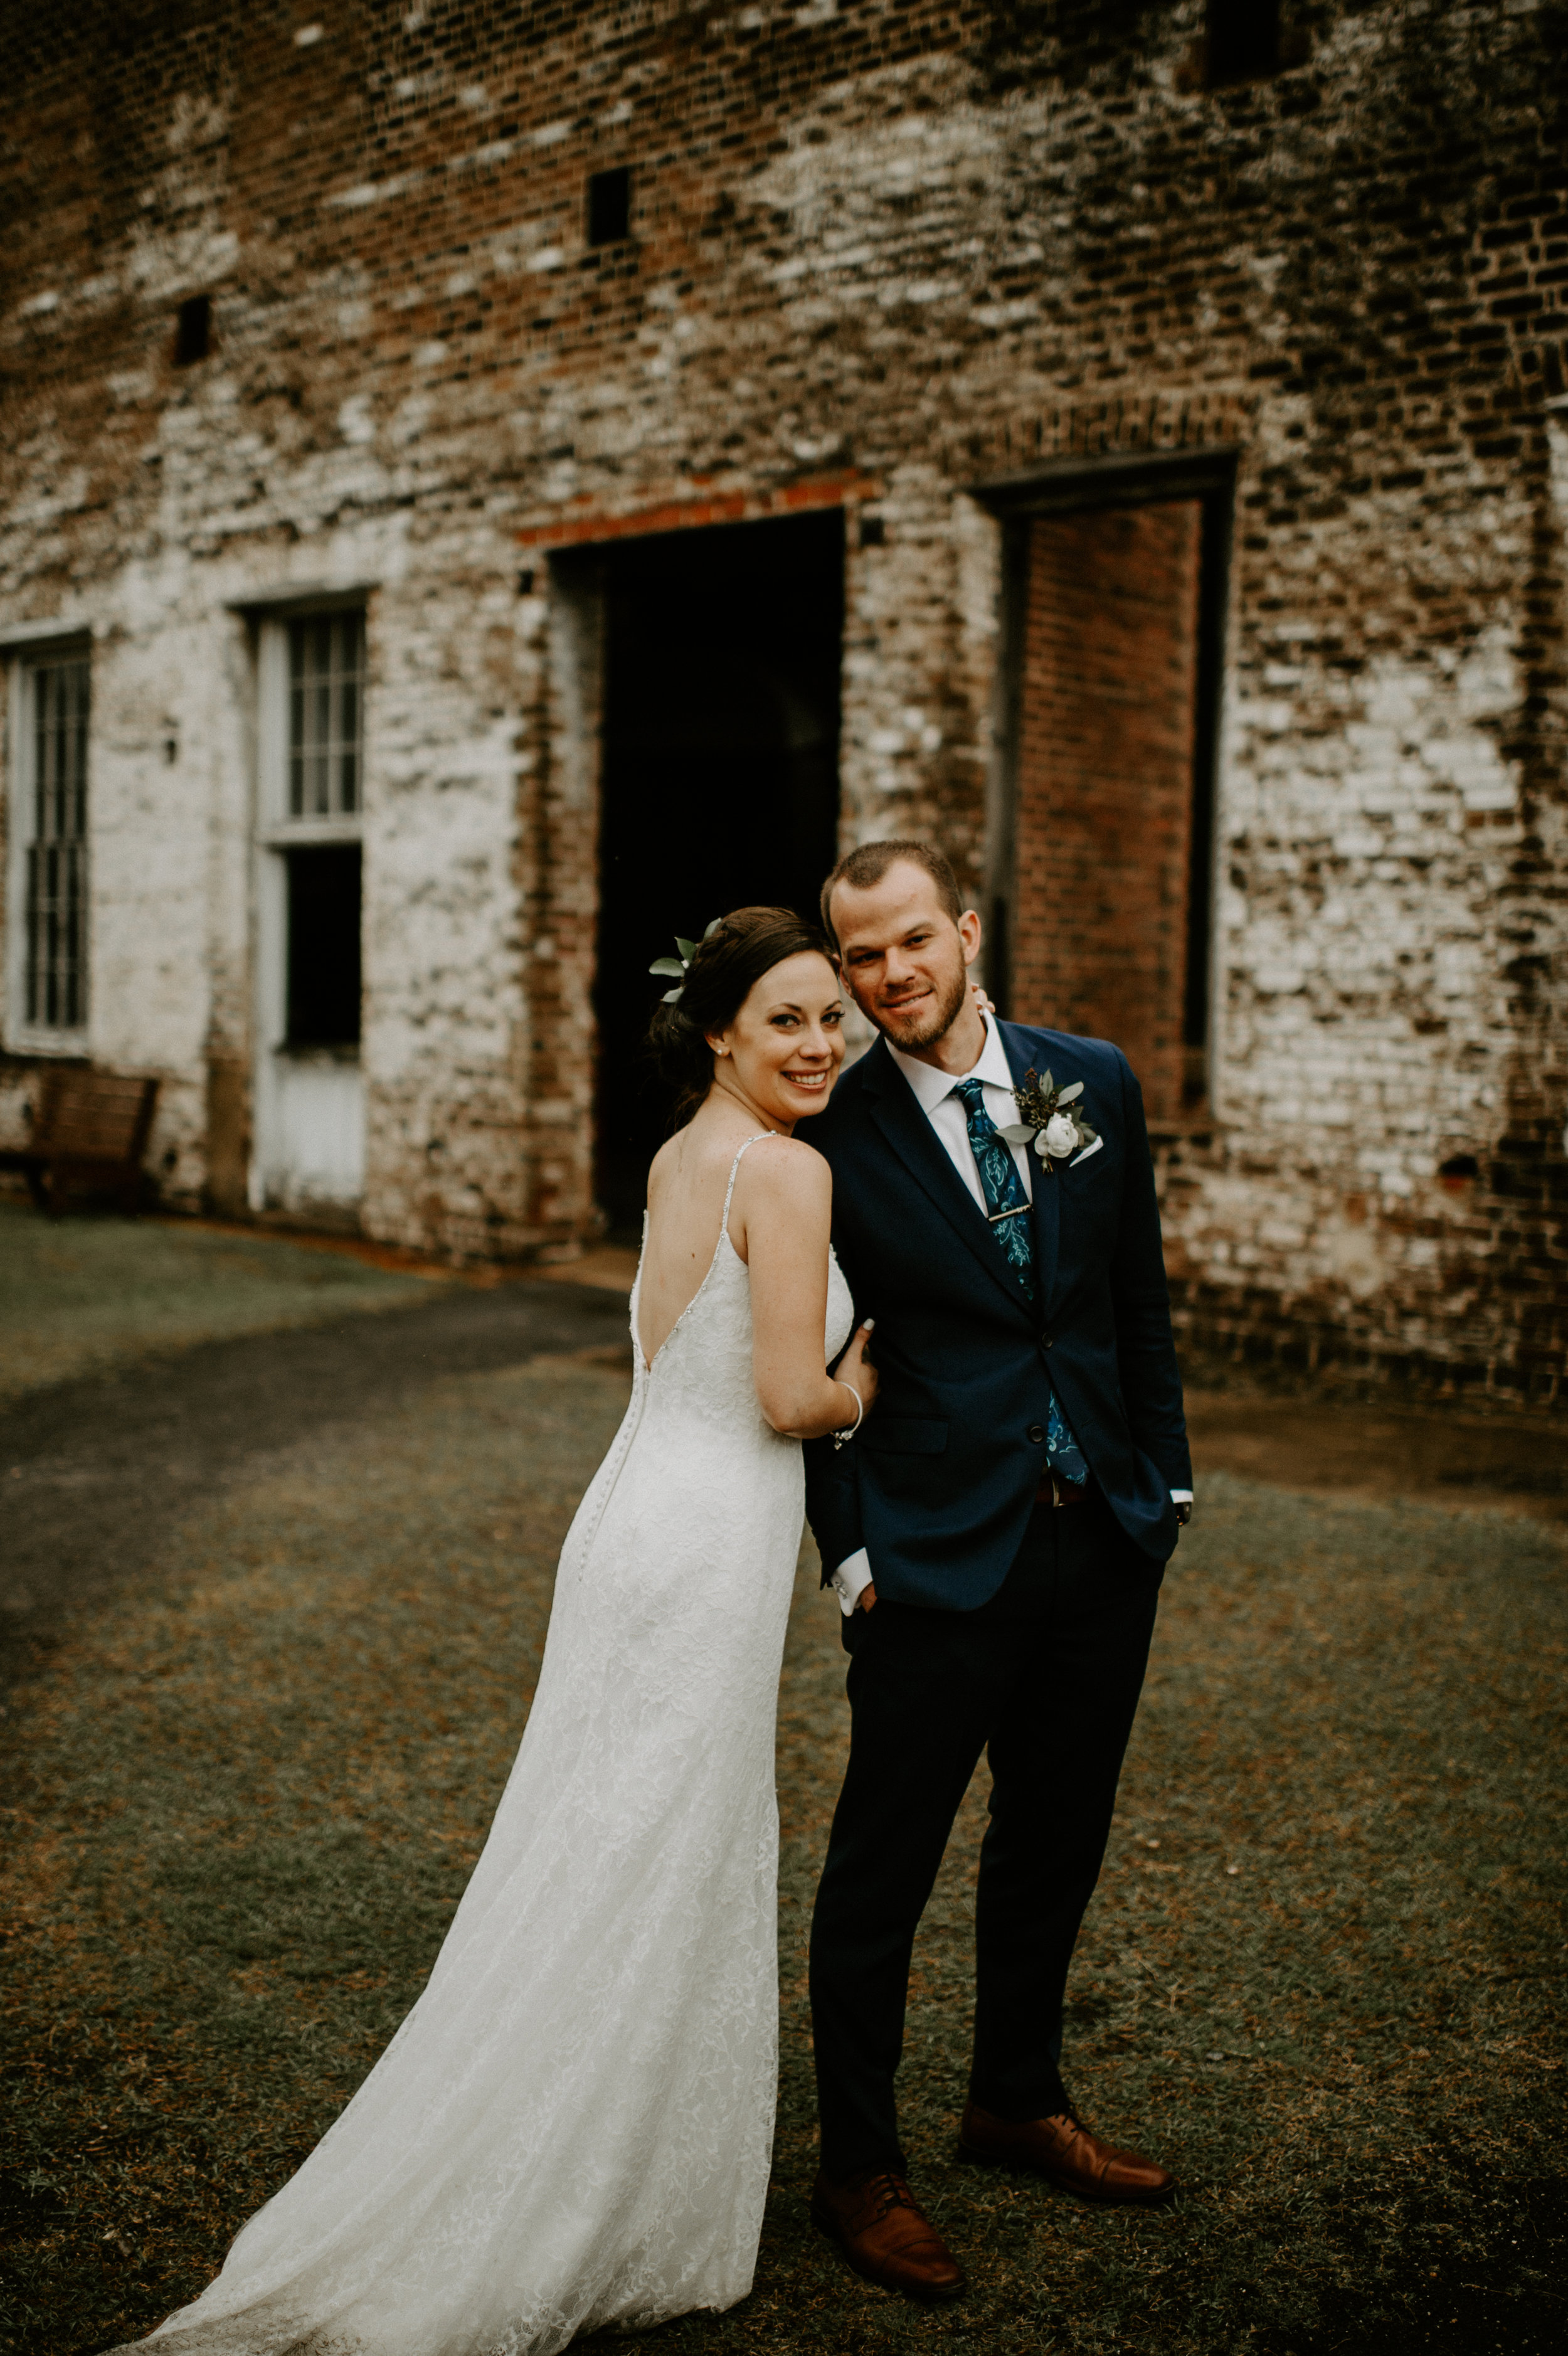 savannah-bridal-shop-andrea-and-mike-evergold-photography-georgia-state-railroad-museum-wedding-savannah-wedding-florist-savannah-wedding-planner-42.jpg